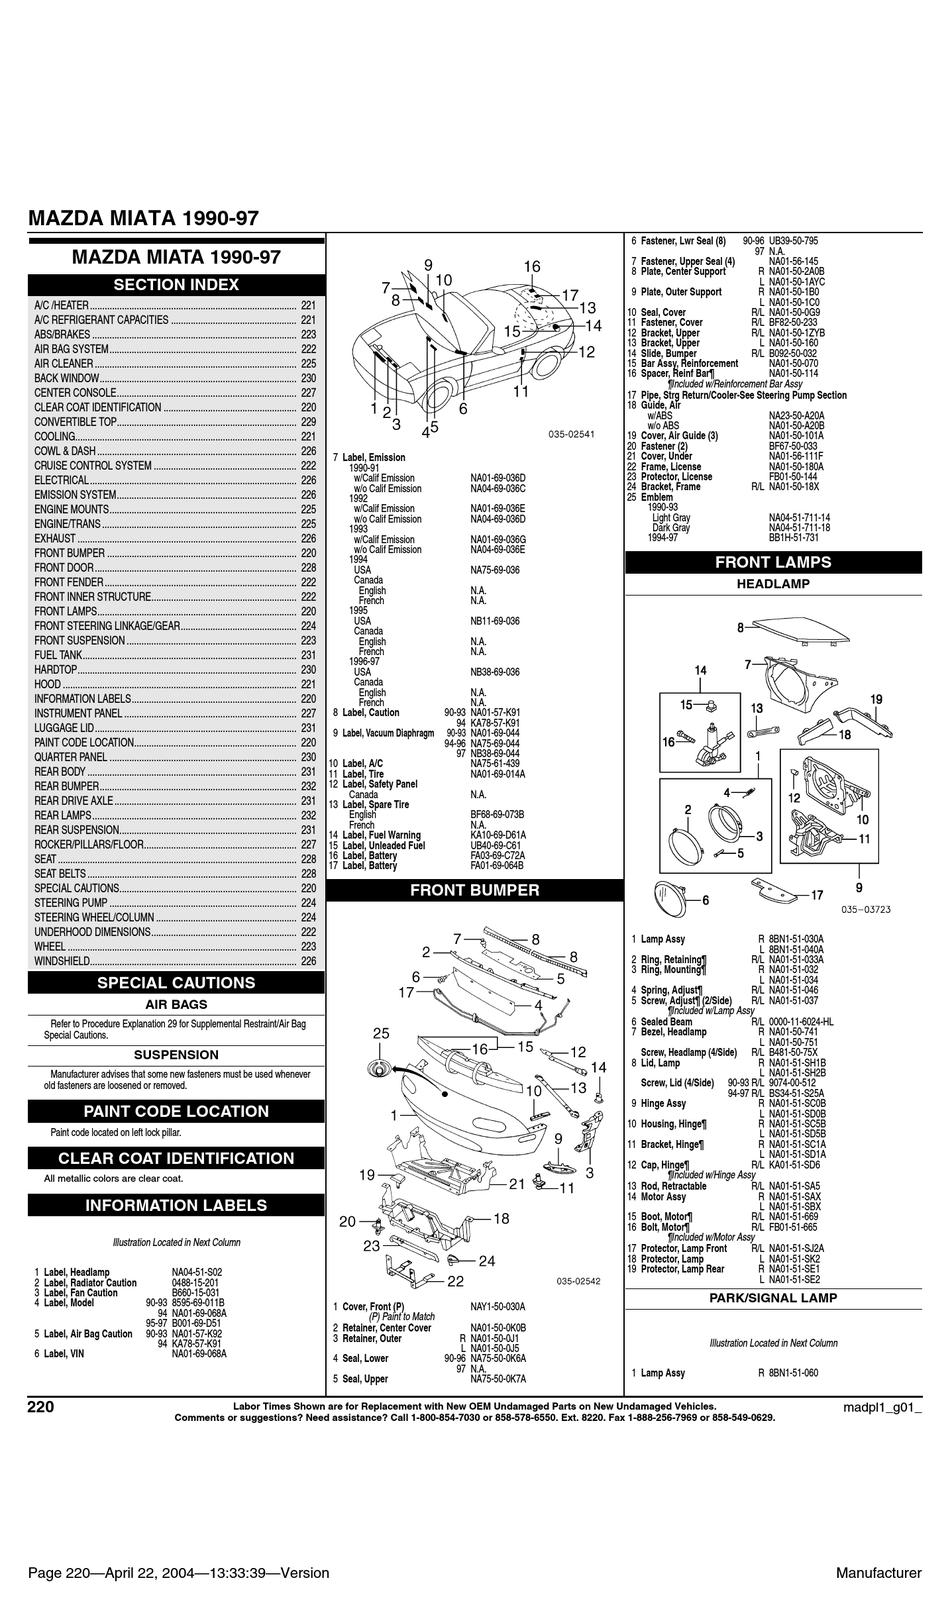 Mazda 1990 Miata Manual Pdf Download Manualslib